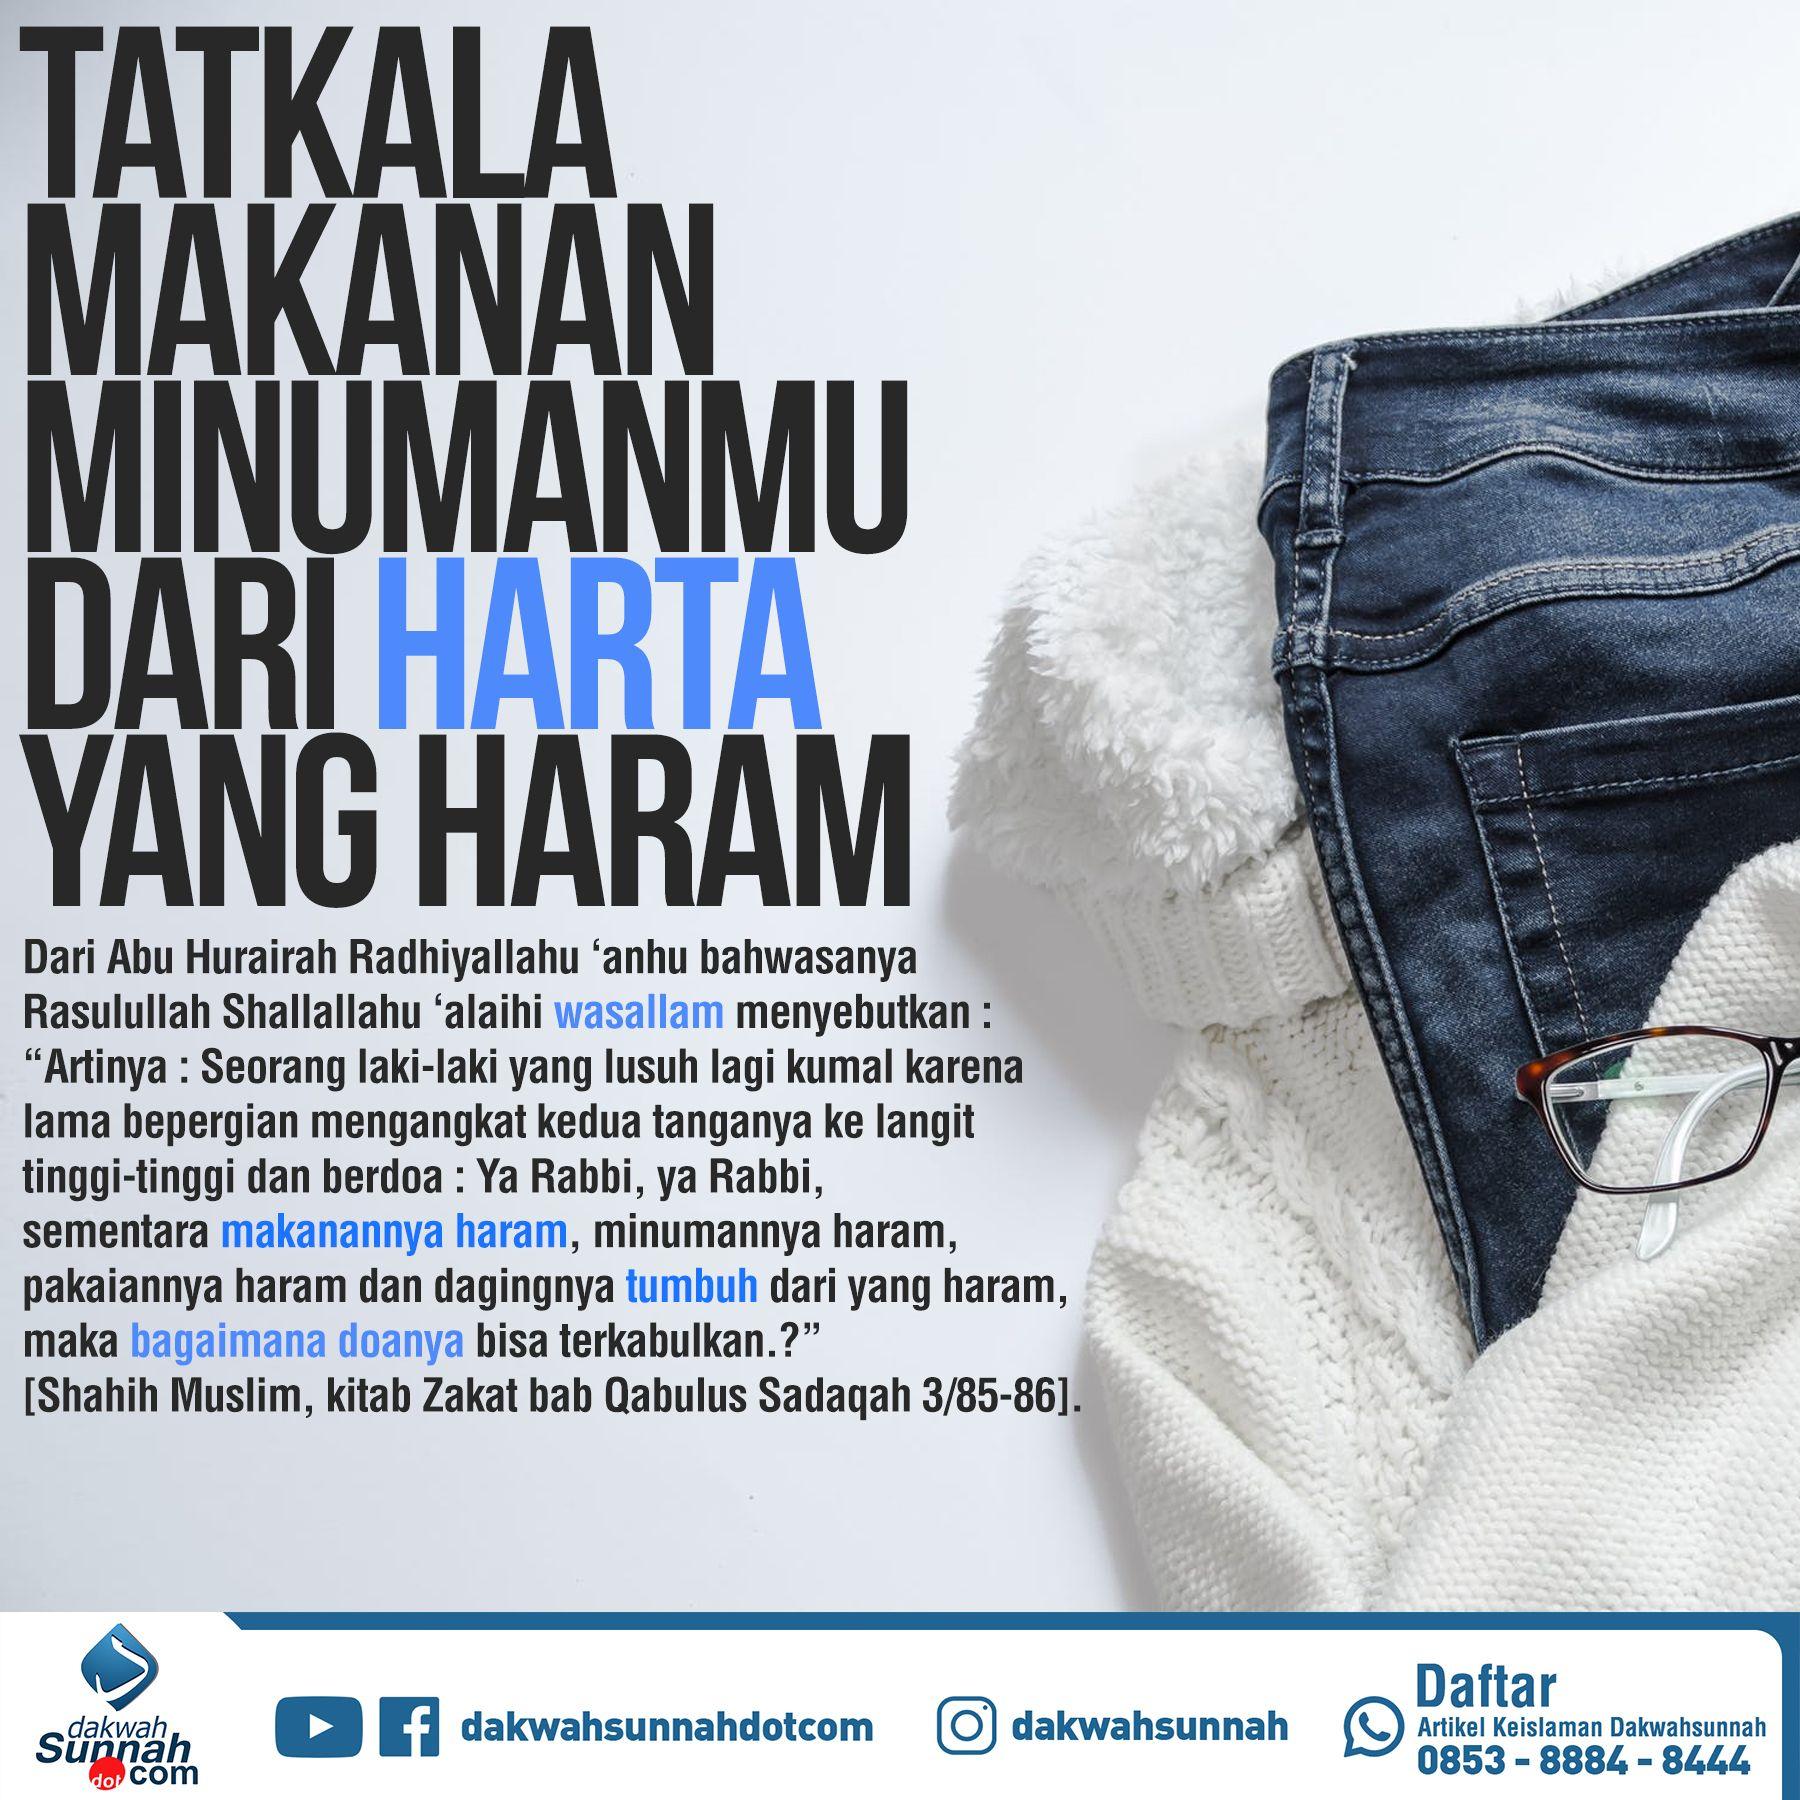 Pengaruh Harta Haram Motivasi Qur An Sahabat